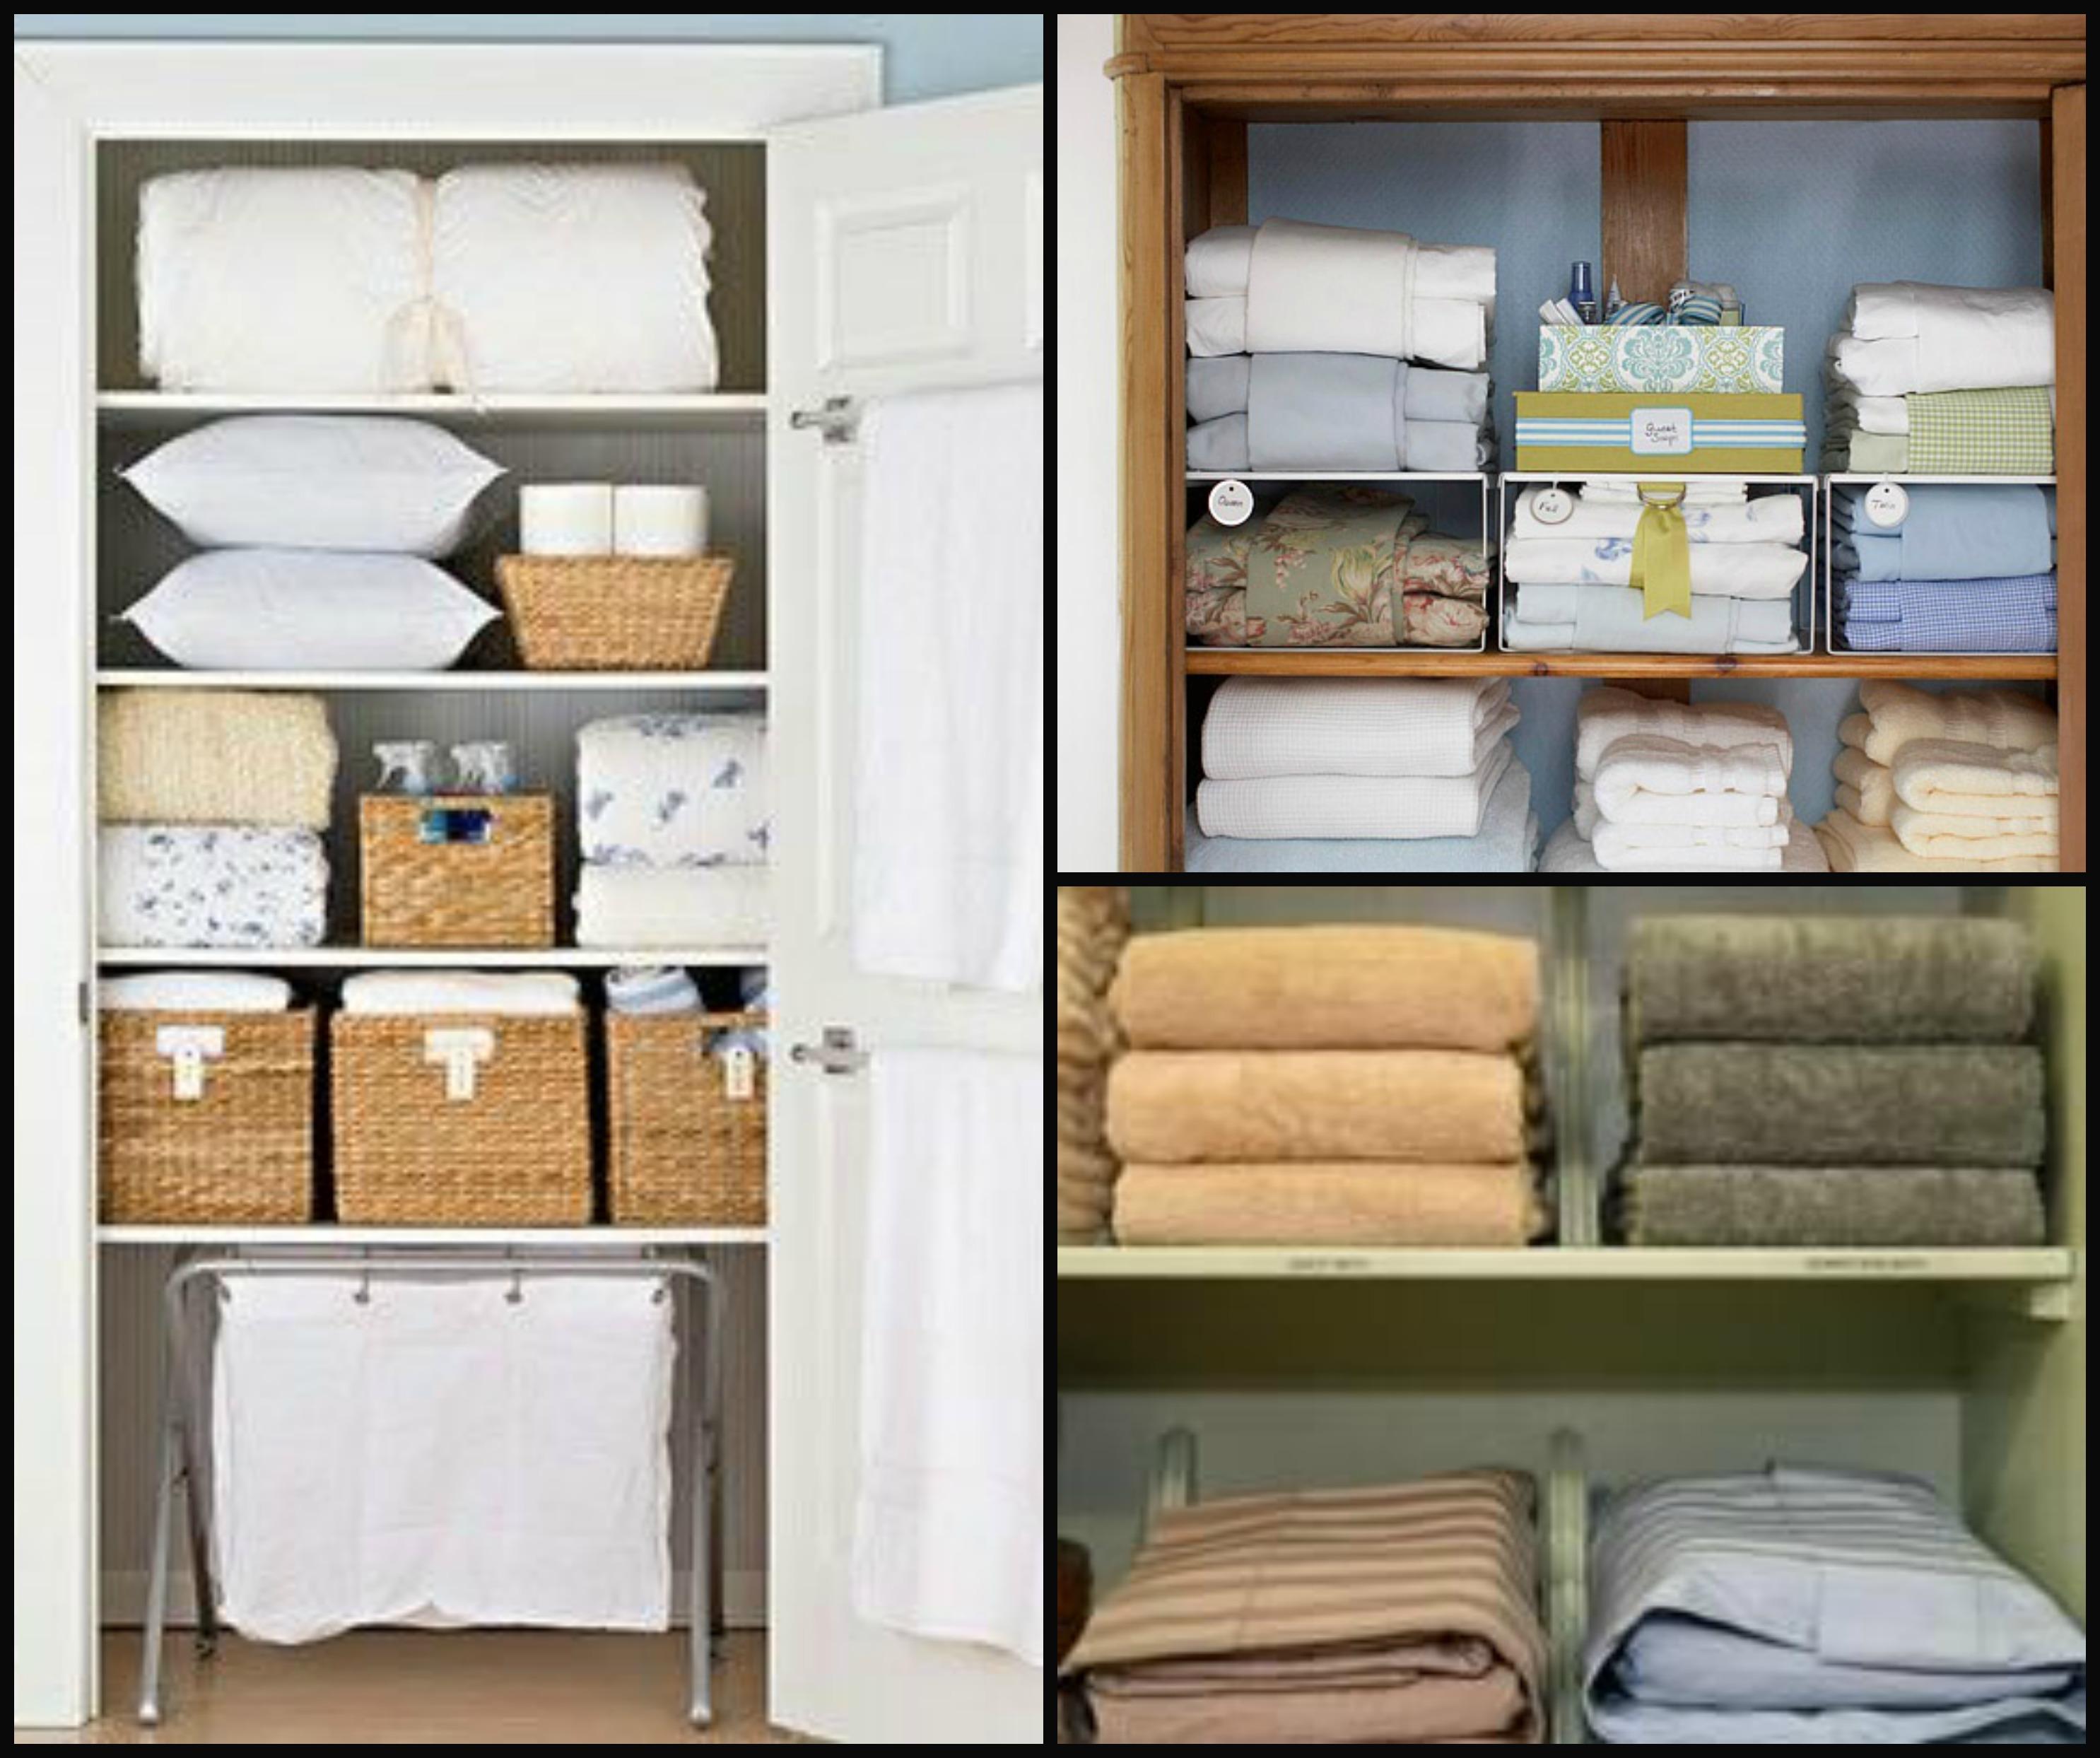 Linen Closet Organizers A Solution To Organize Linens Homesfeed